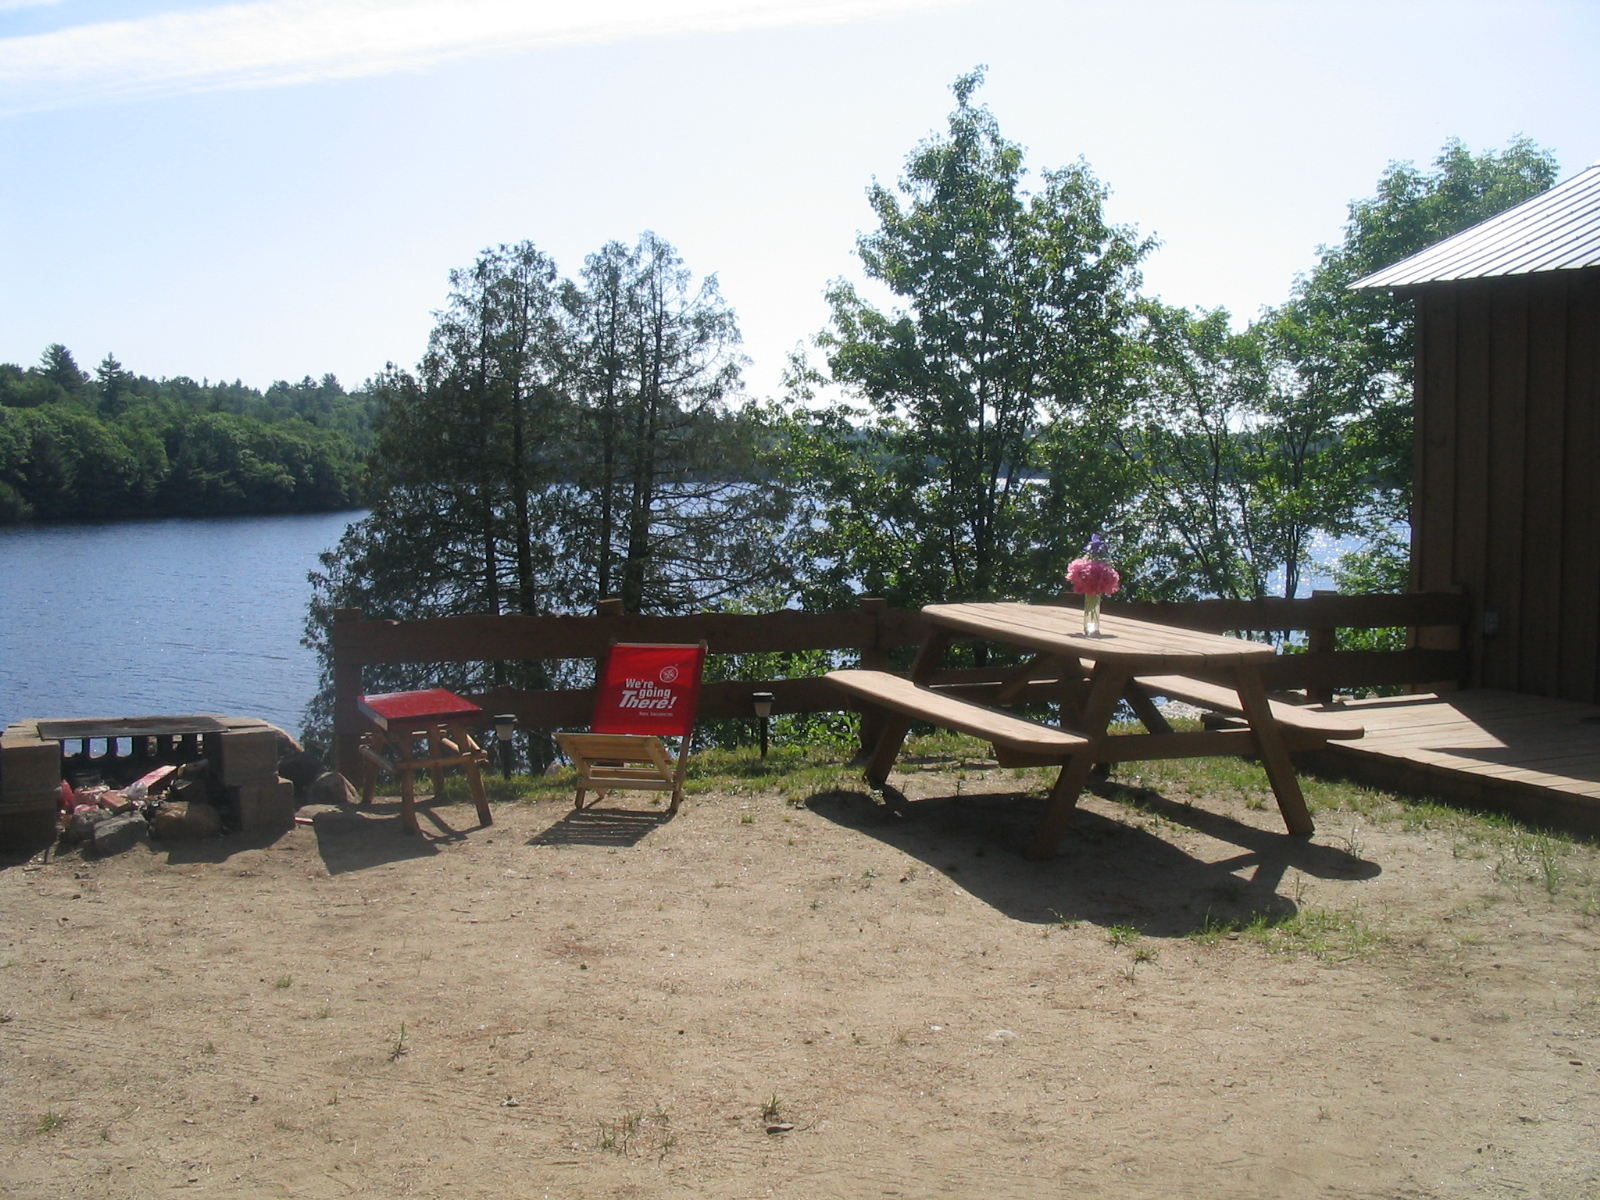 Cabin 1-2 fire pit area